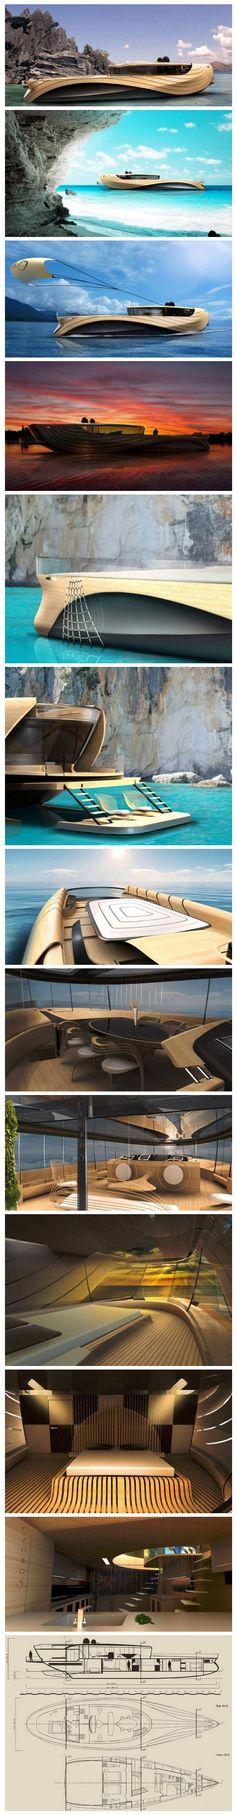 Futuristic Cronos Yacht concept | Justearnmoneyonline.com